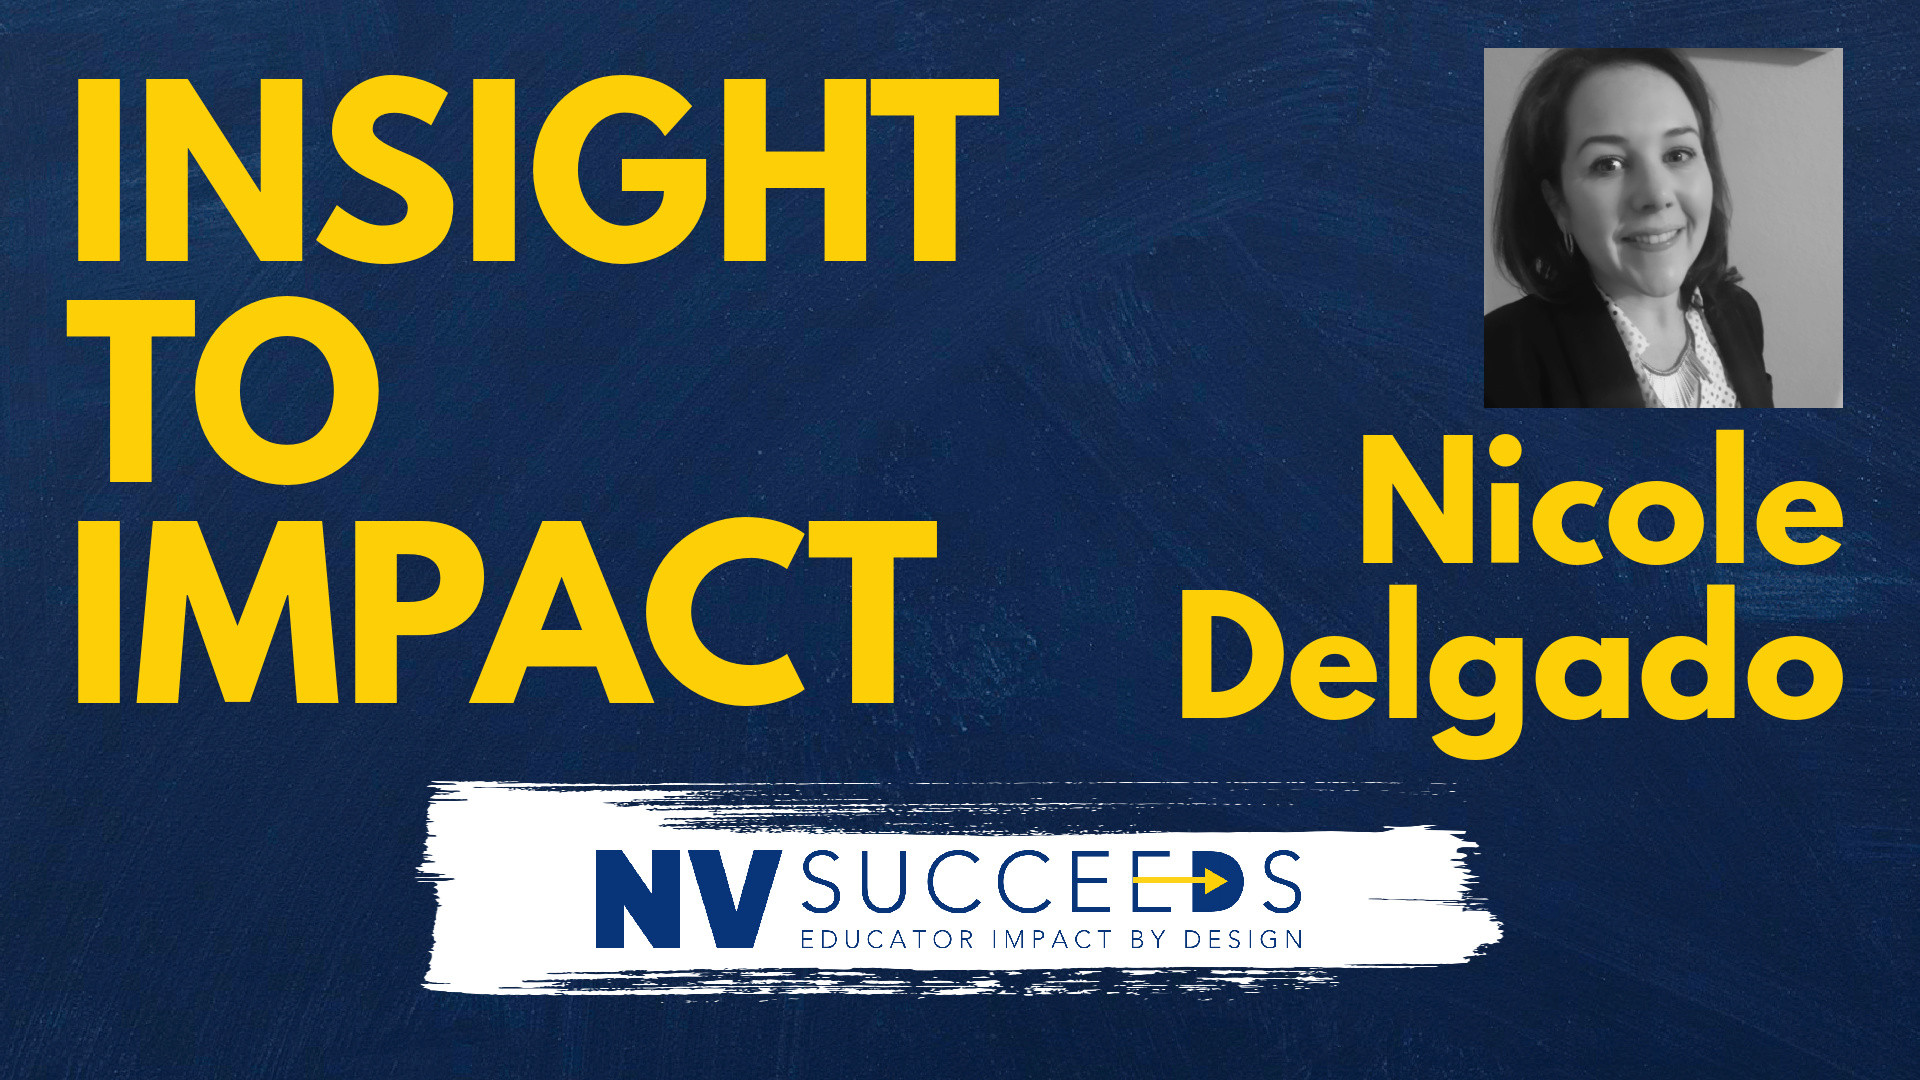 INSIGHT TO IMPACT with Nicole Delgado